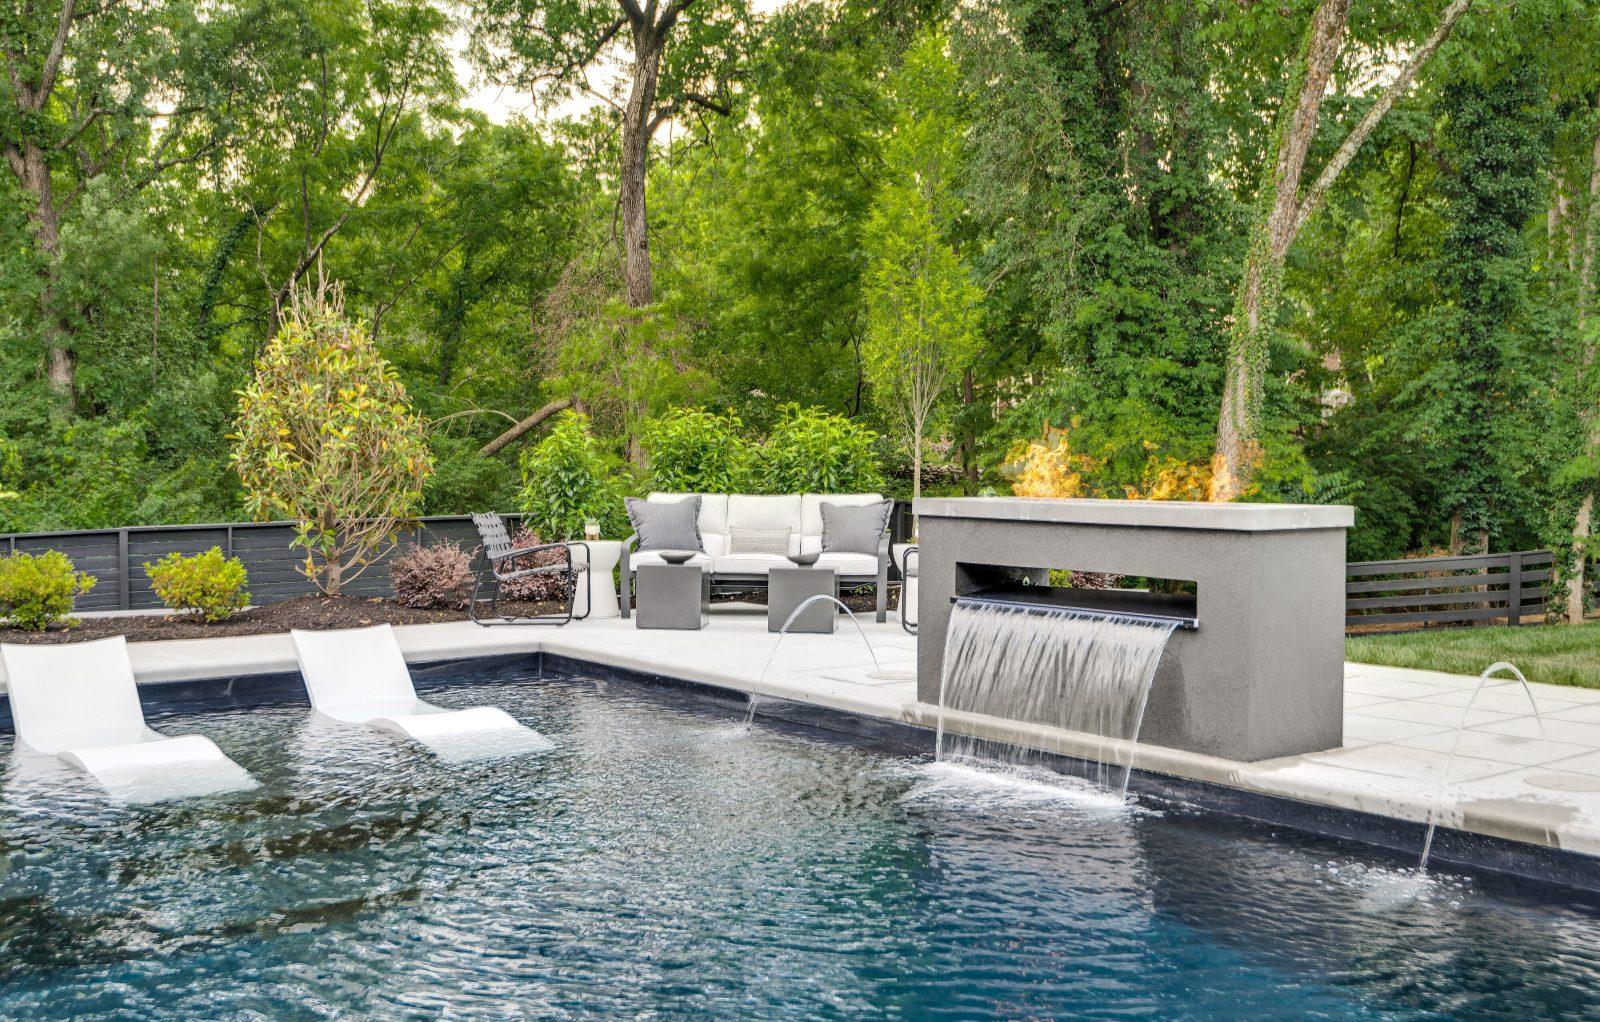 Backyard pool oasis in Nashville TN close to Green Hills TN